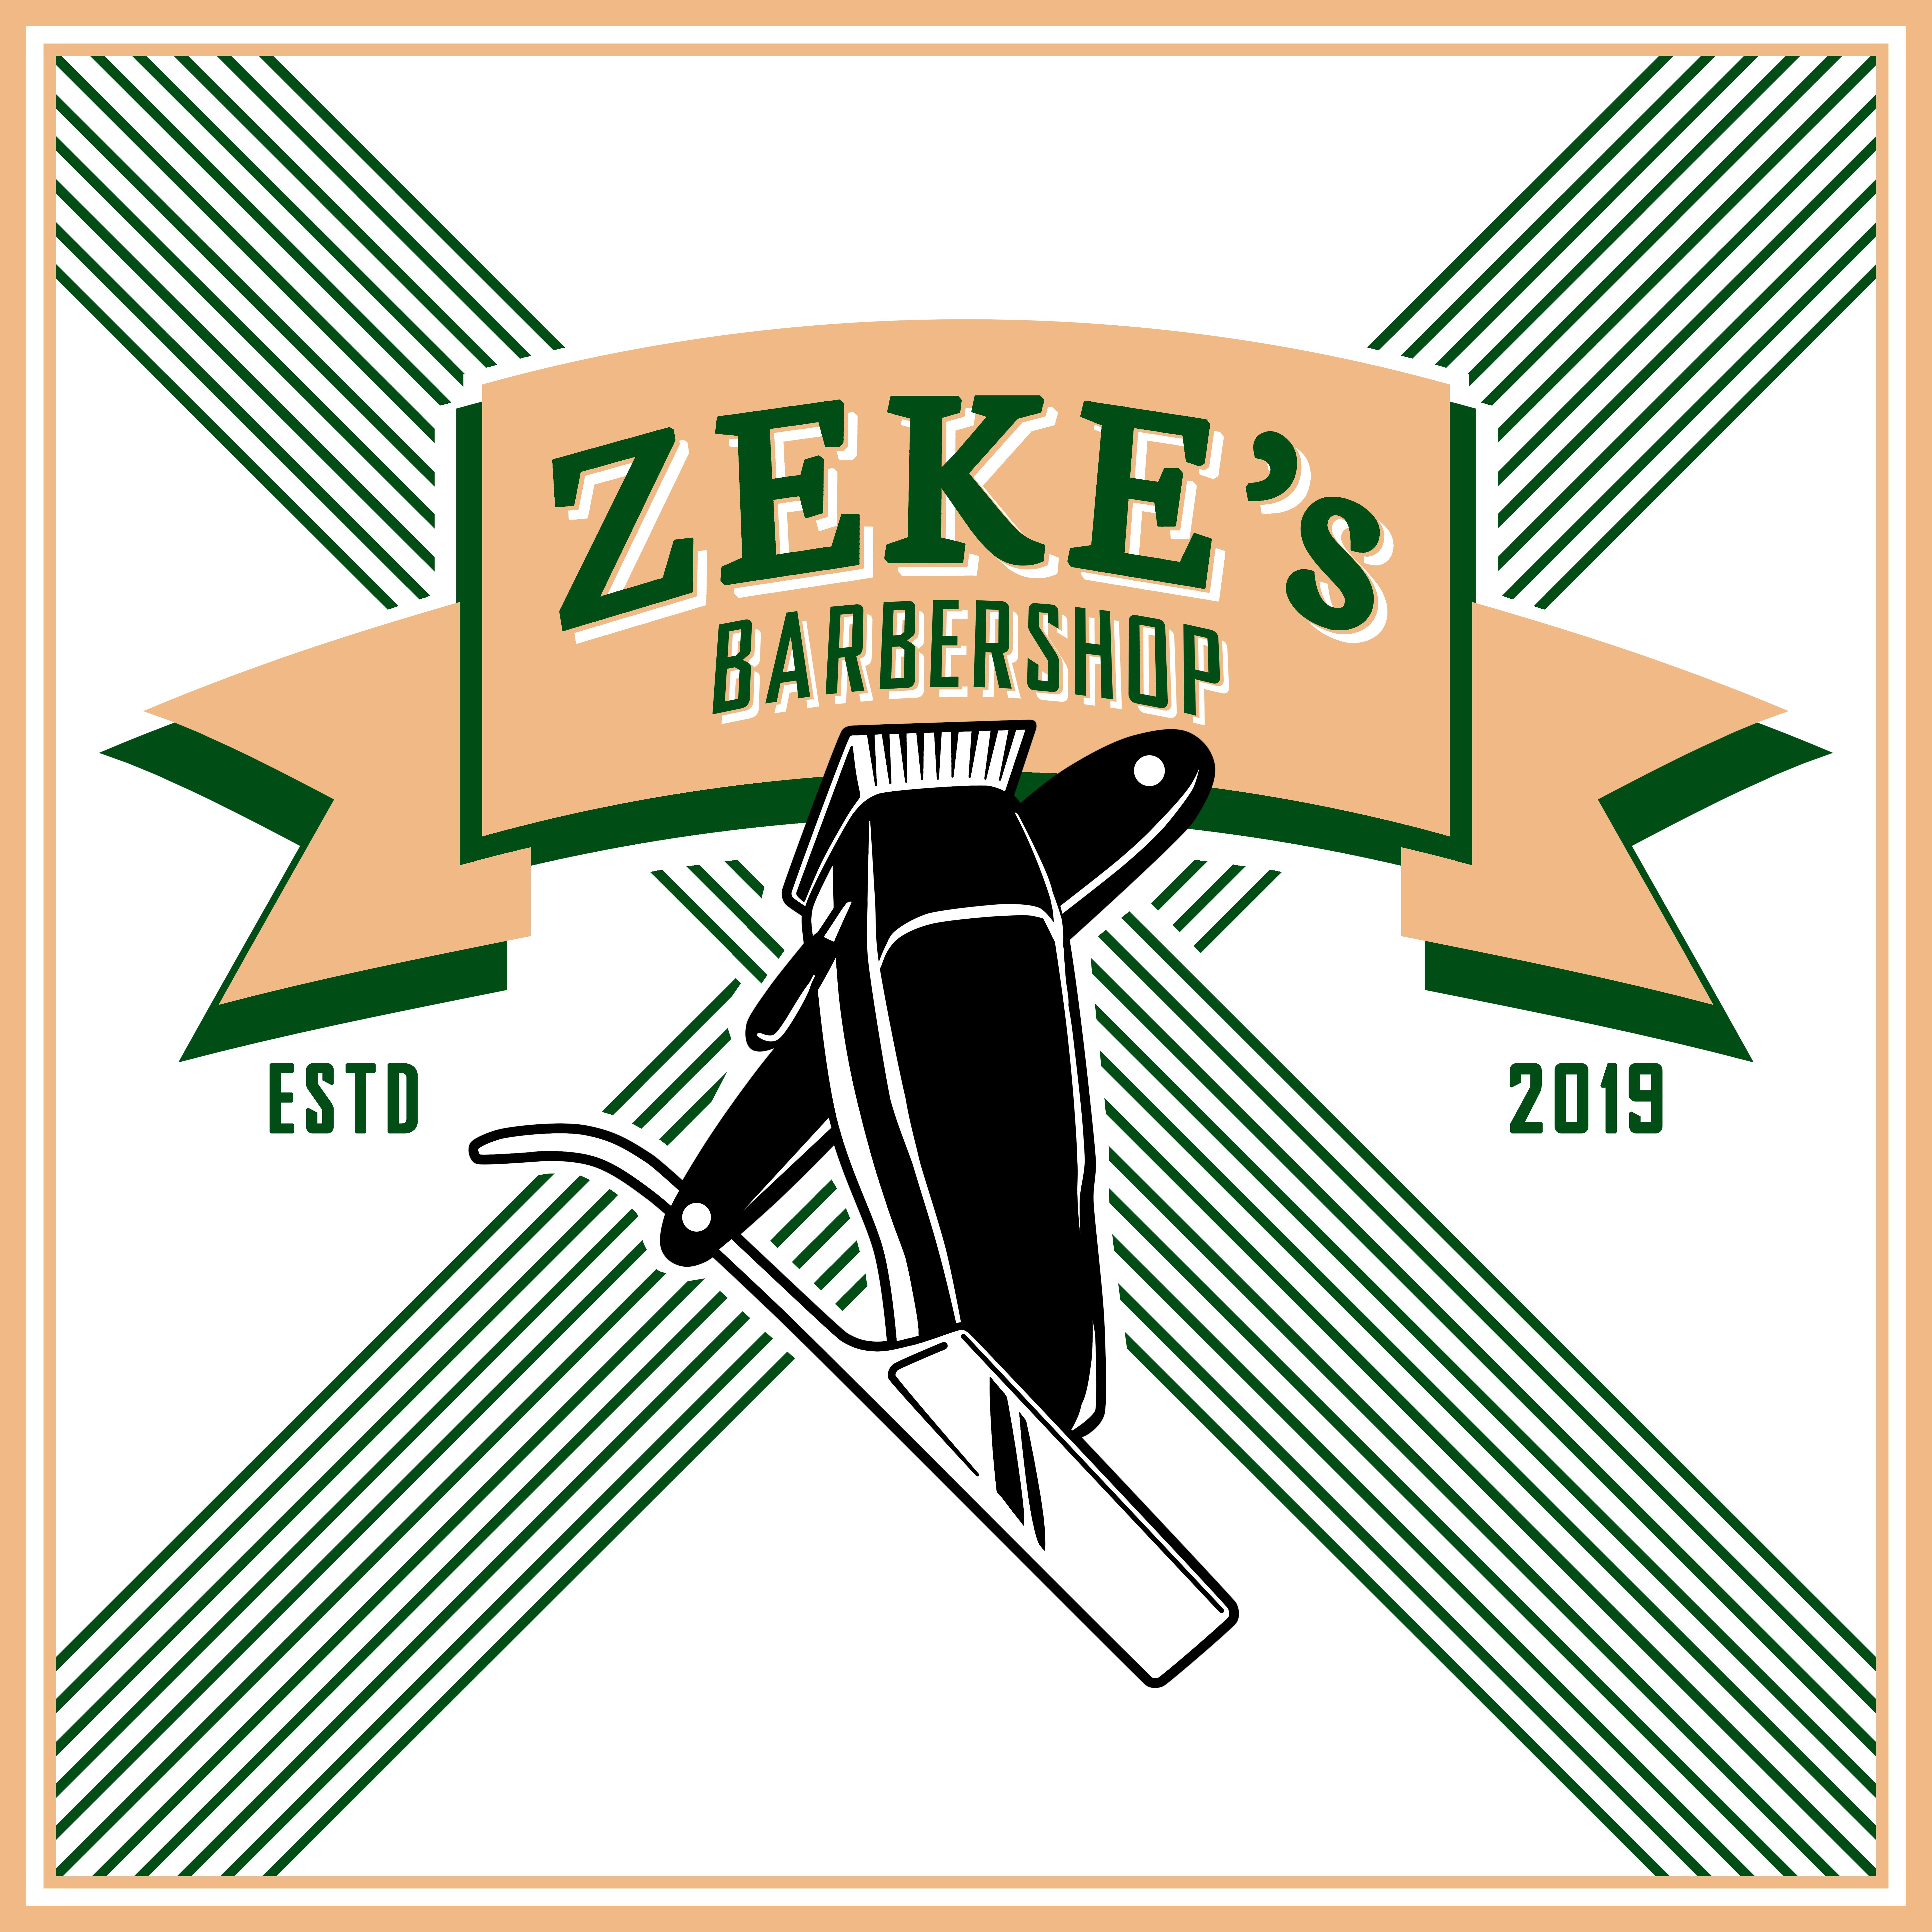 ZEKE's Barbershop